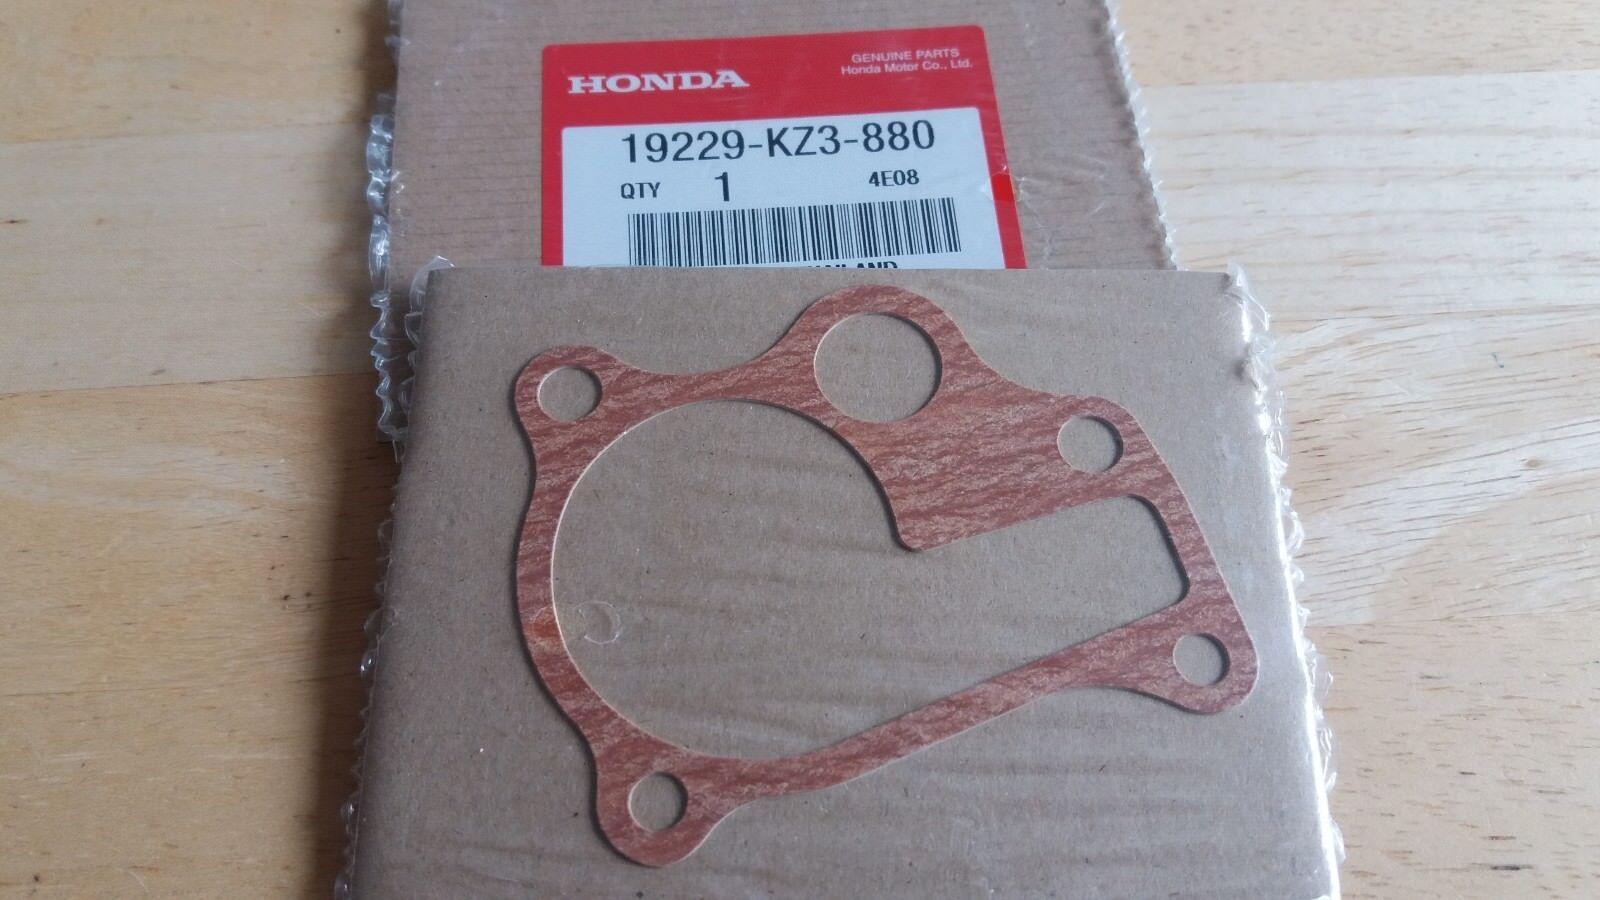 1992-2001 Honda CR250R Water Pump Cover Gasket 19229-KZ3-880 CR 250R